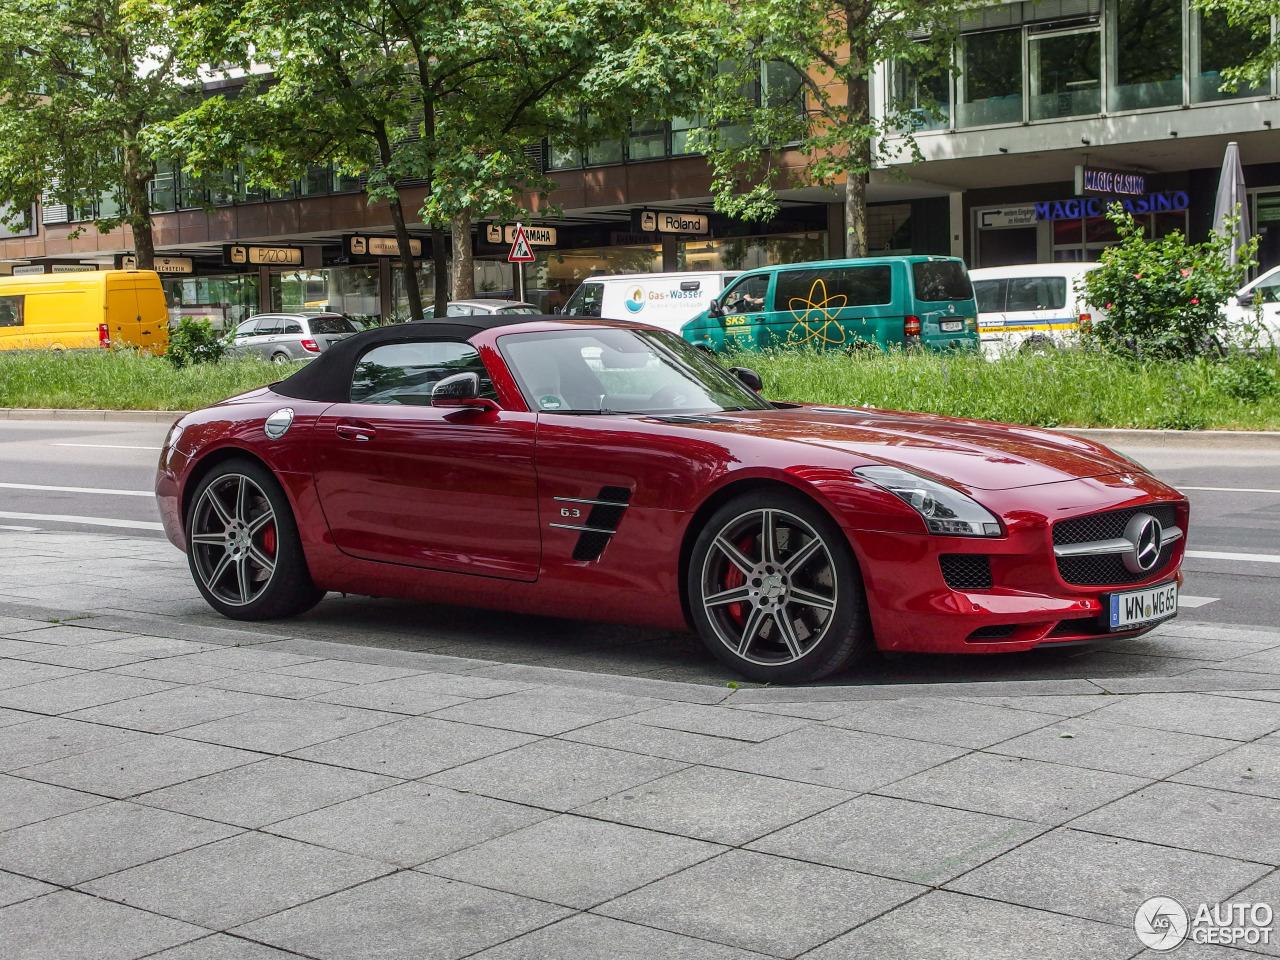 Mercedes benz sls amg roadster 12 mai 2015 autogespot for 2015 mercedes benz sls amg convertible